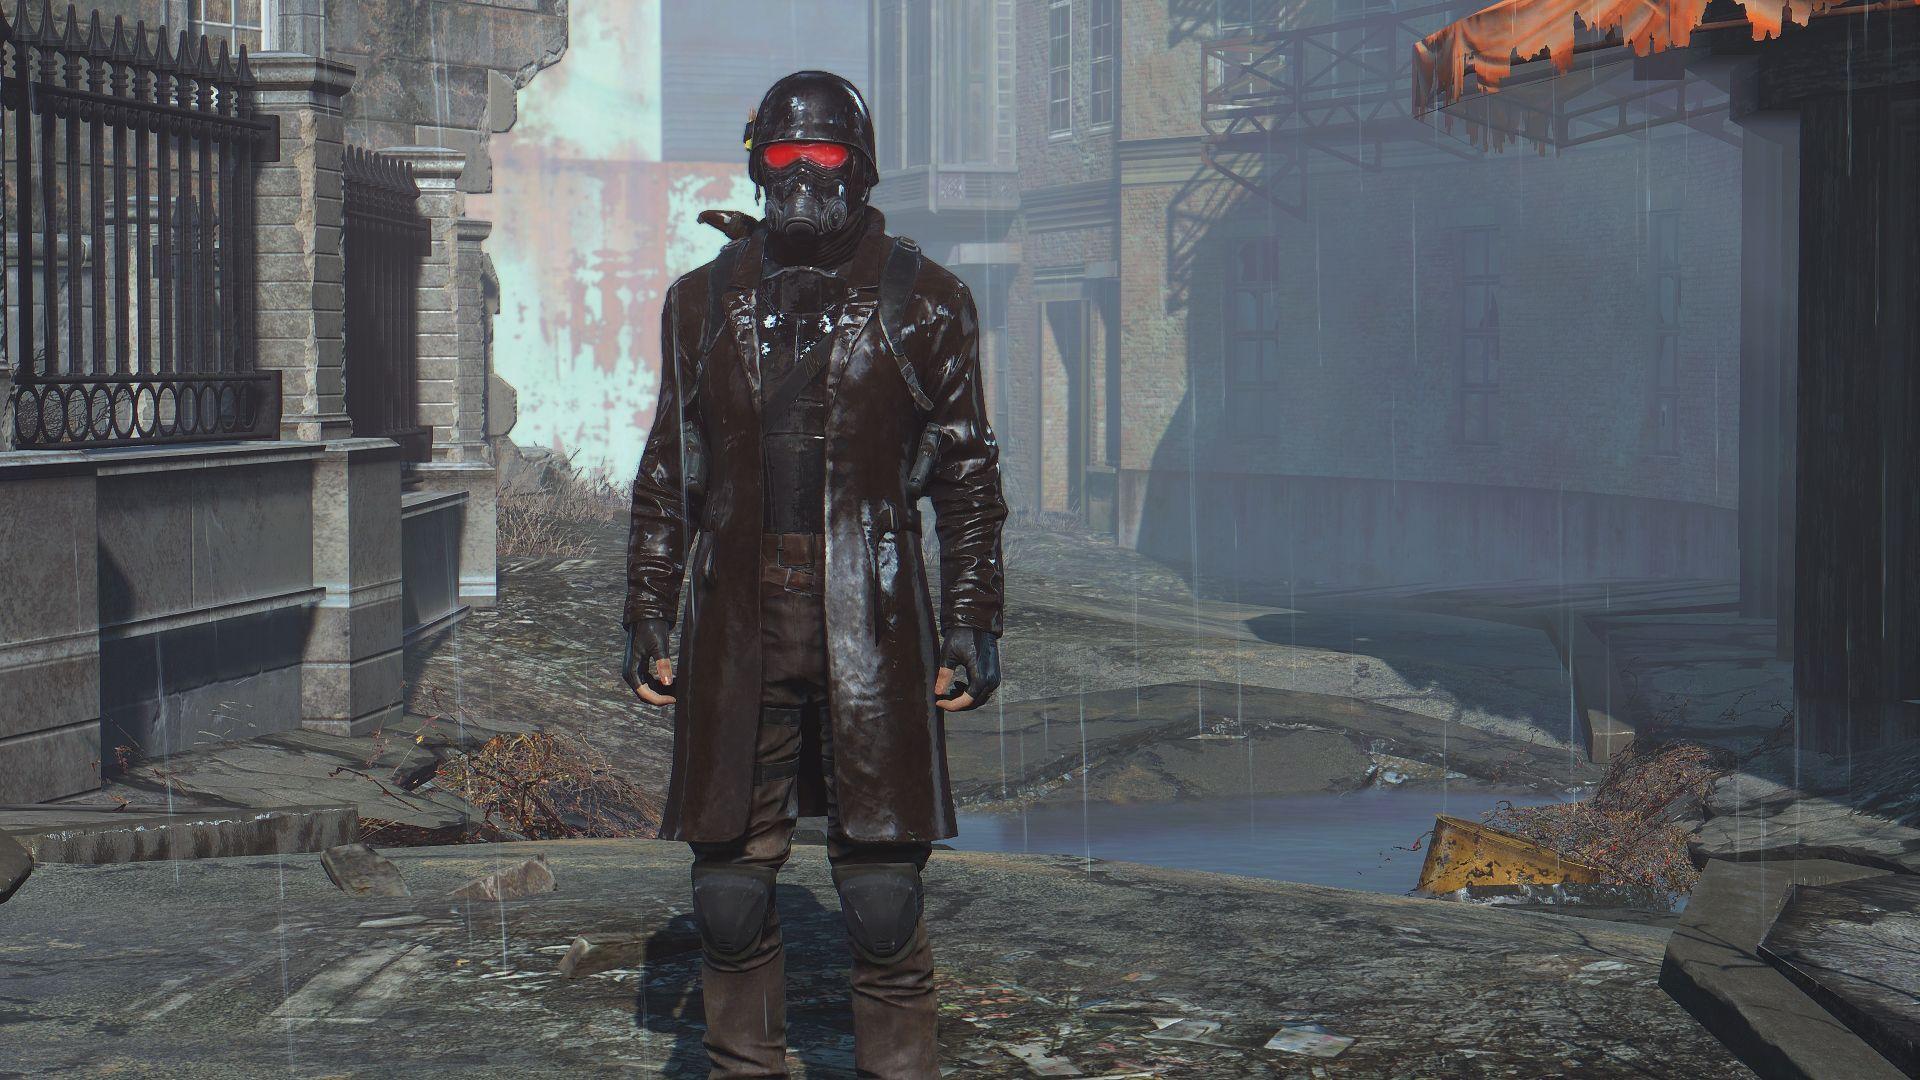 Fallout New Vegas Armored Vault 13 Jumpsuit Mod